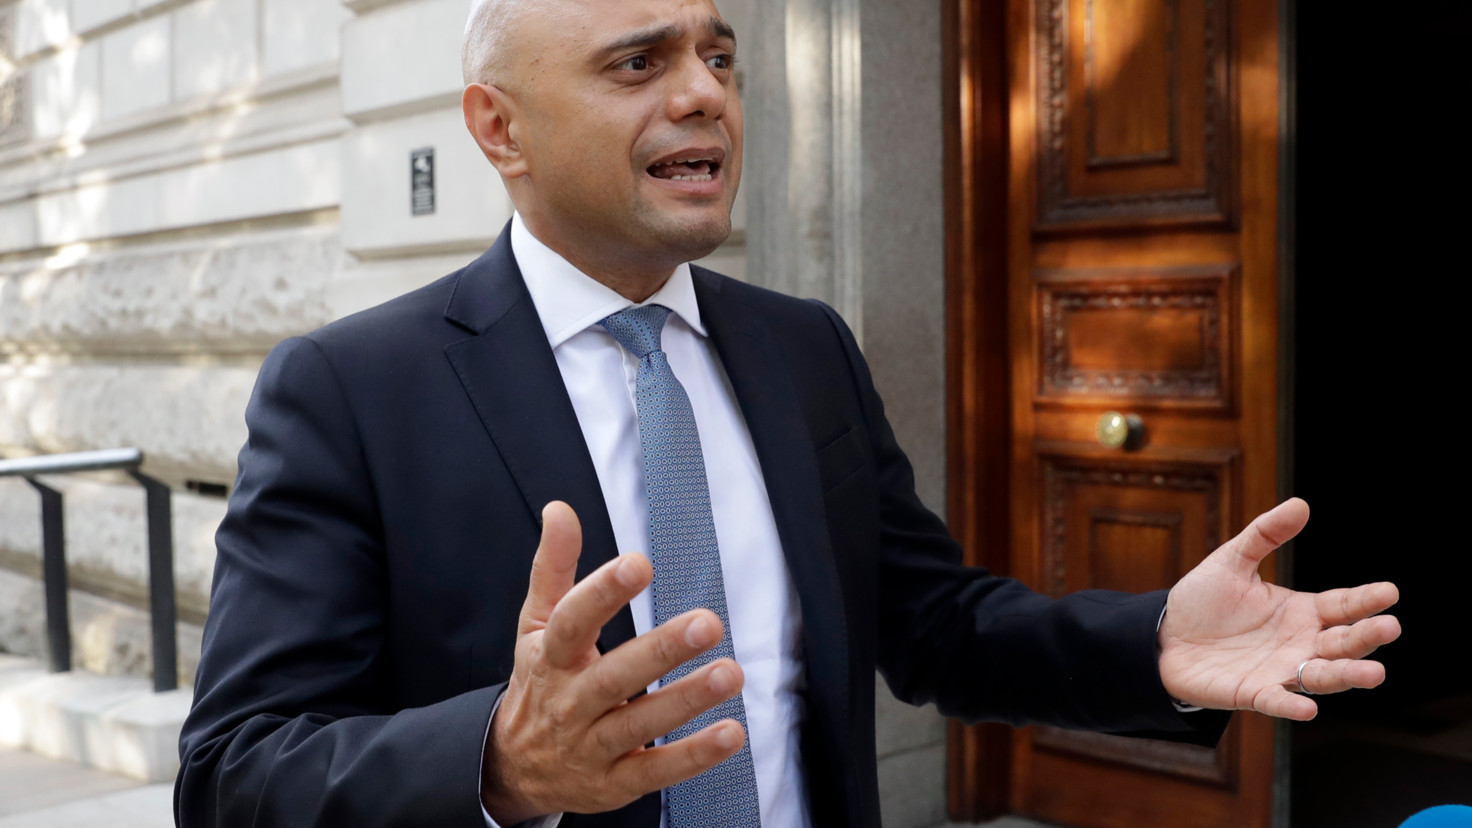 Chancellor Sajid Javid to give his first UK Budget in November